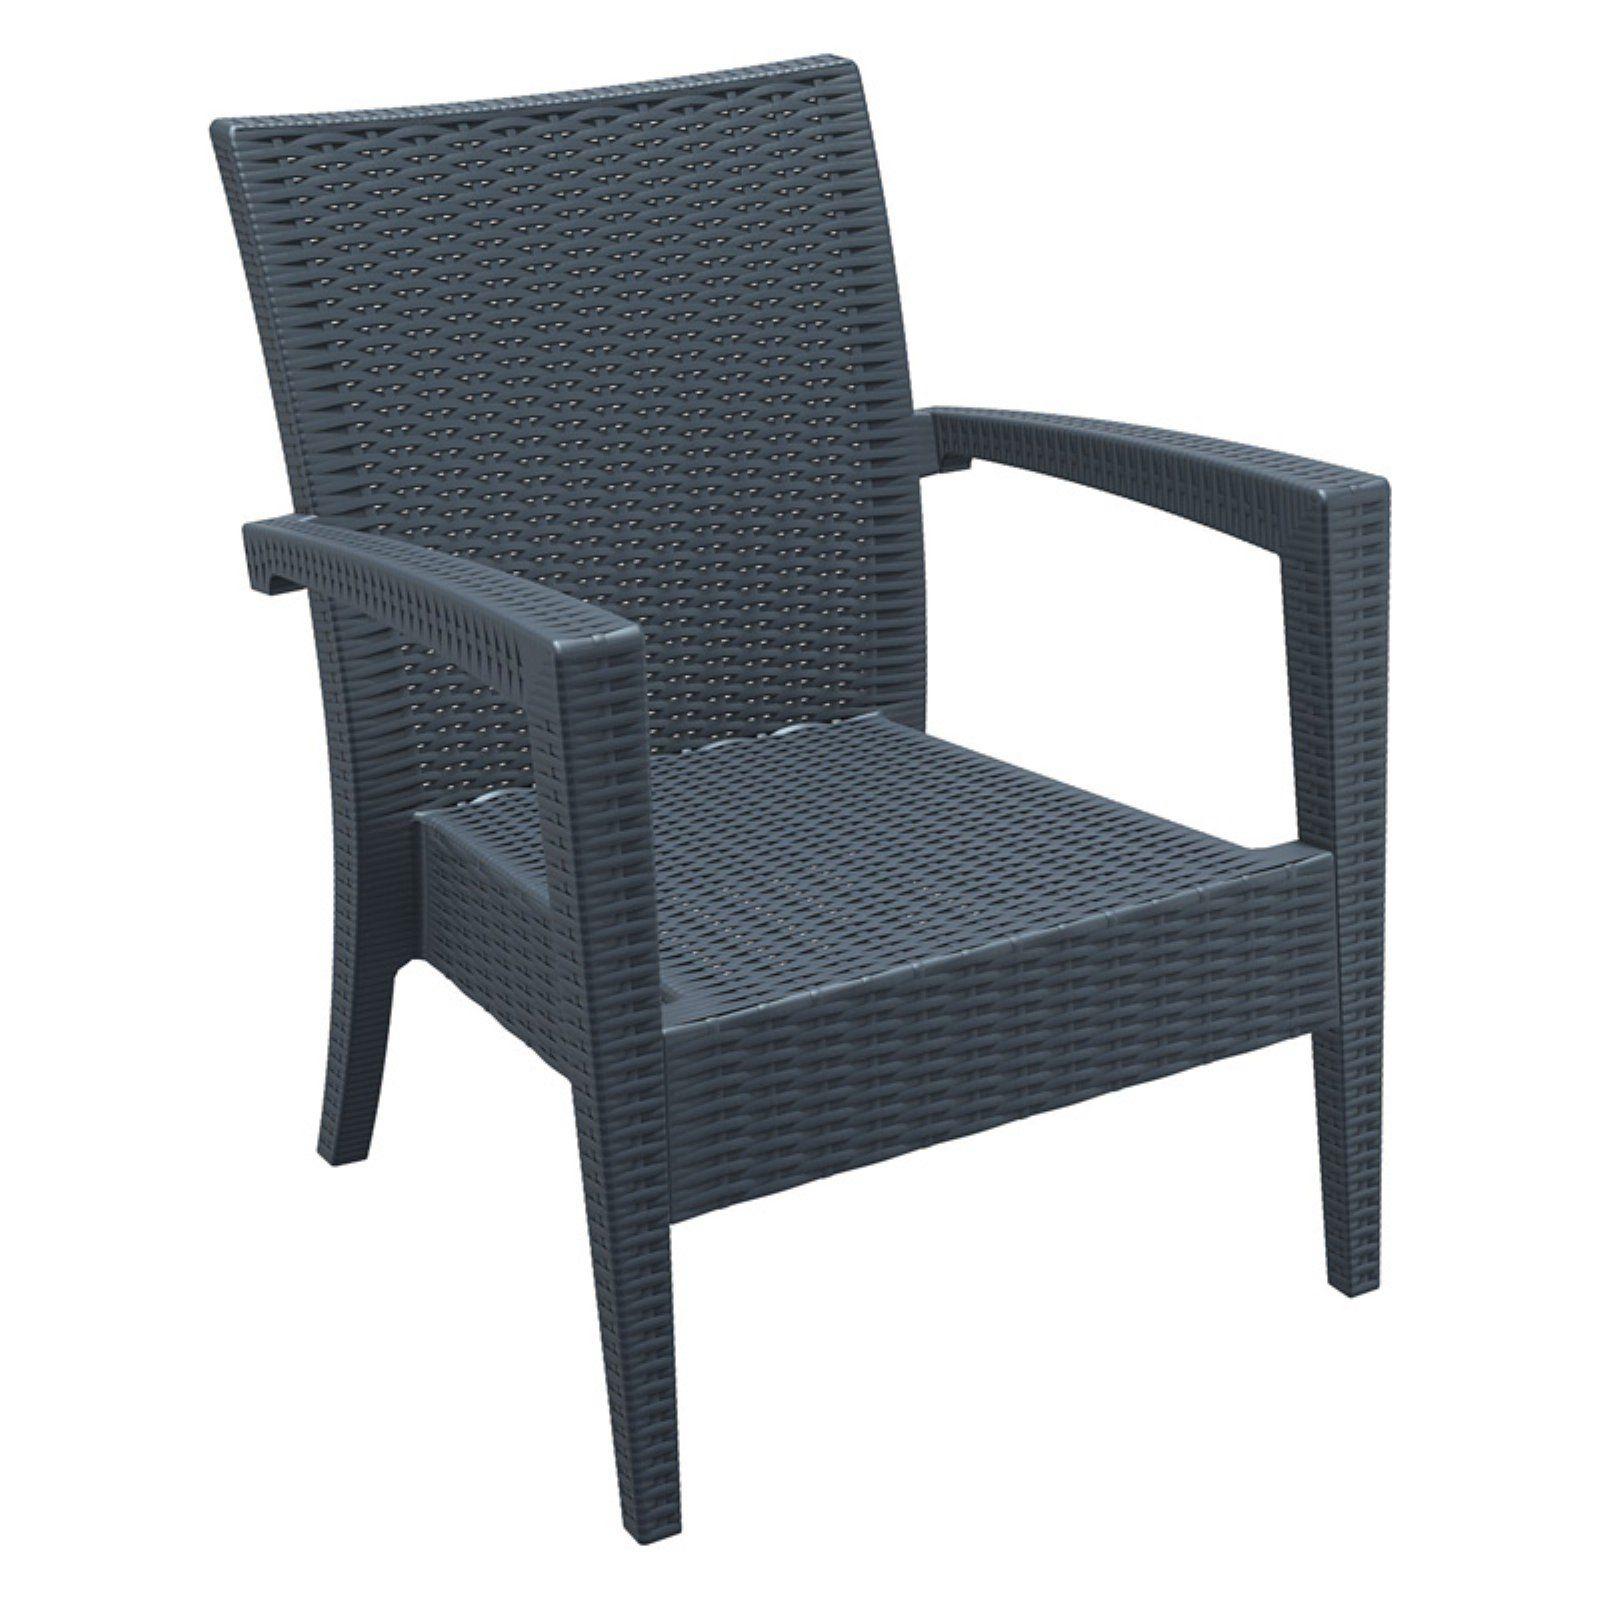 outdoor siesta isp850 miami resin club chair set of 2 in 2019 rh pinterest com